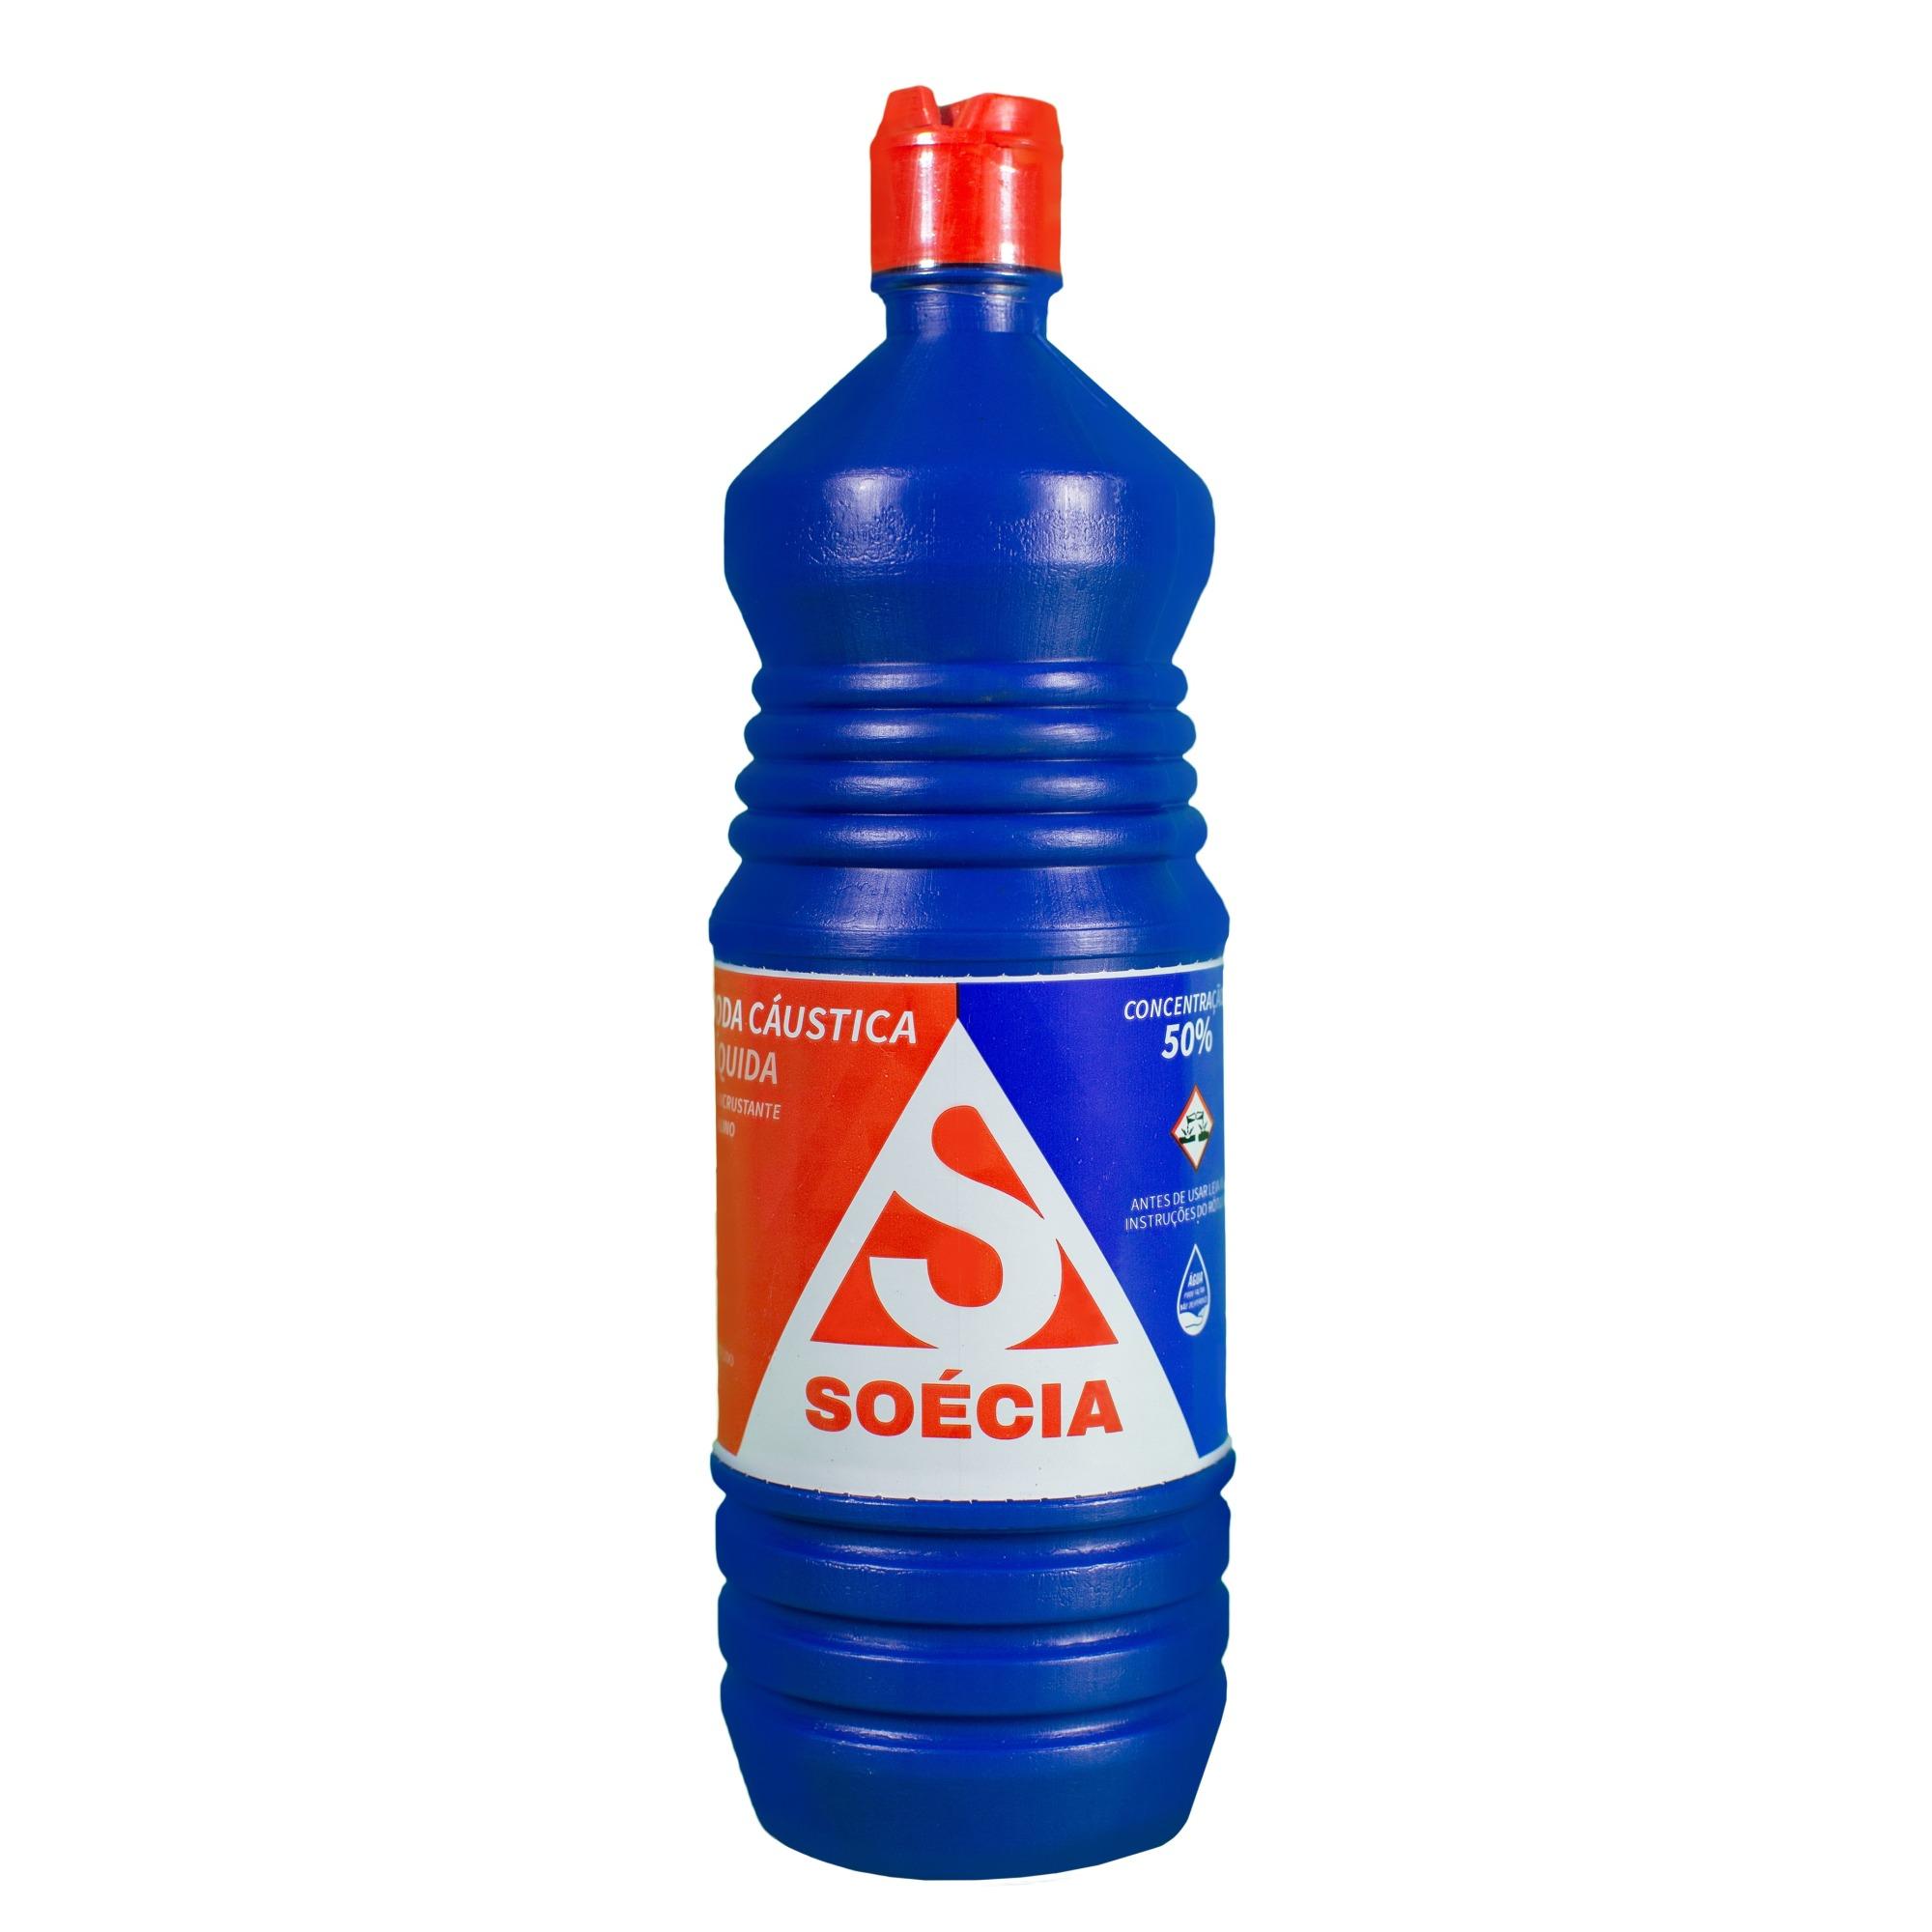 Soda Caustica Liq Soecia 1L